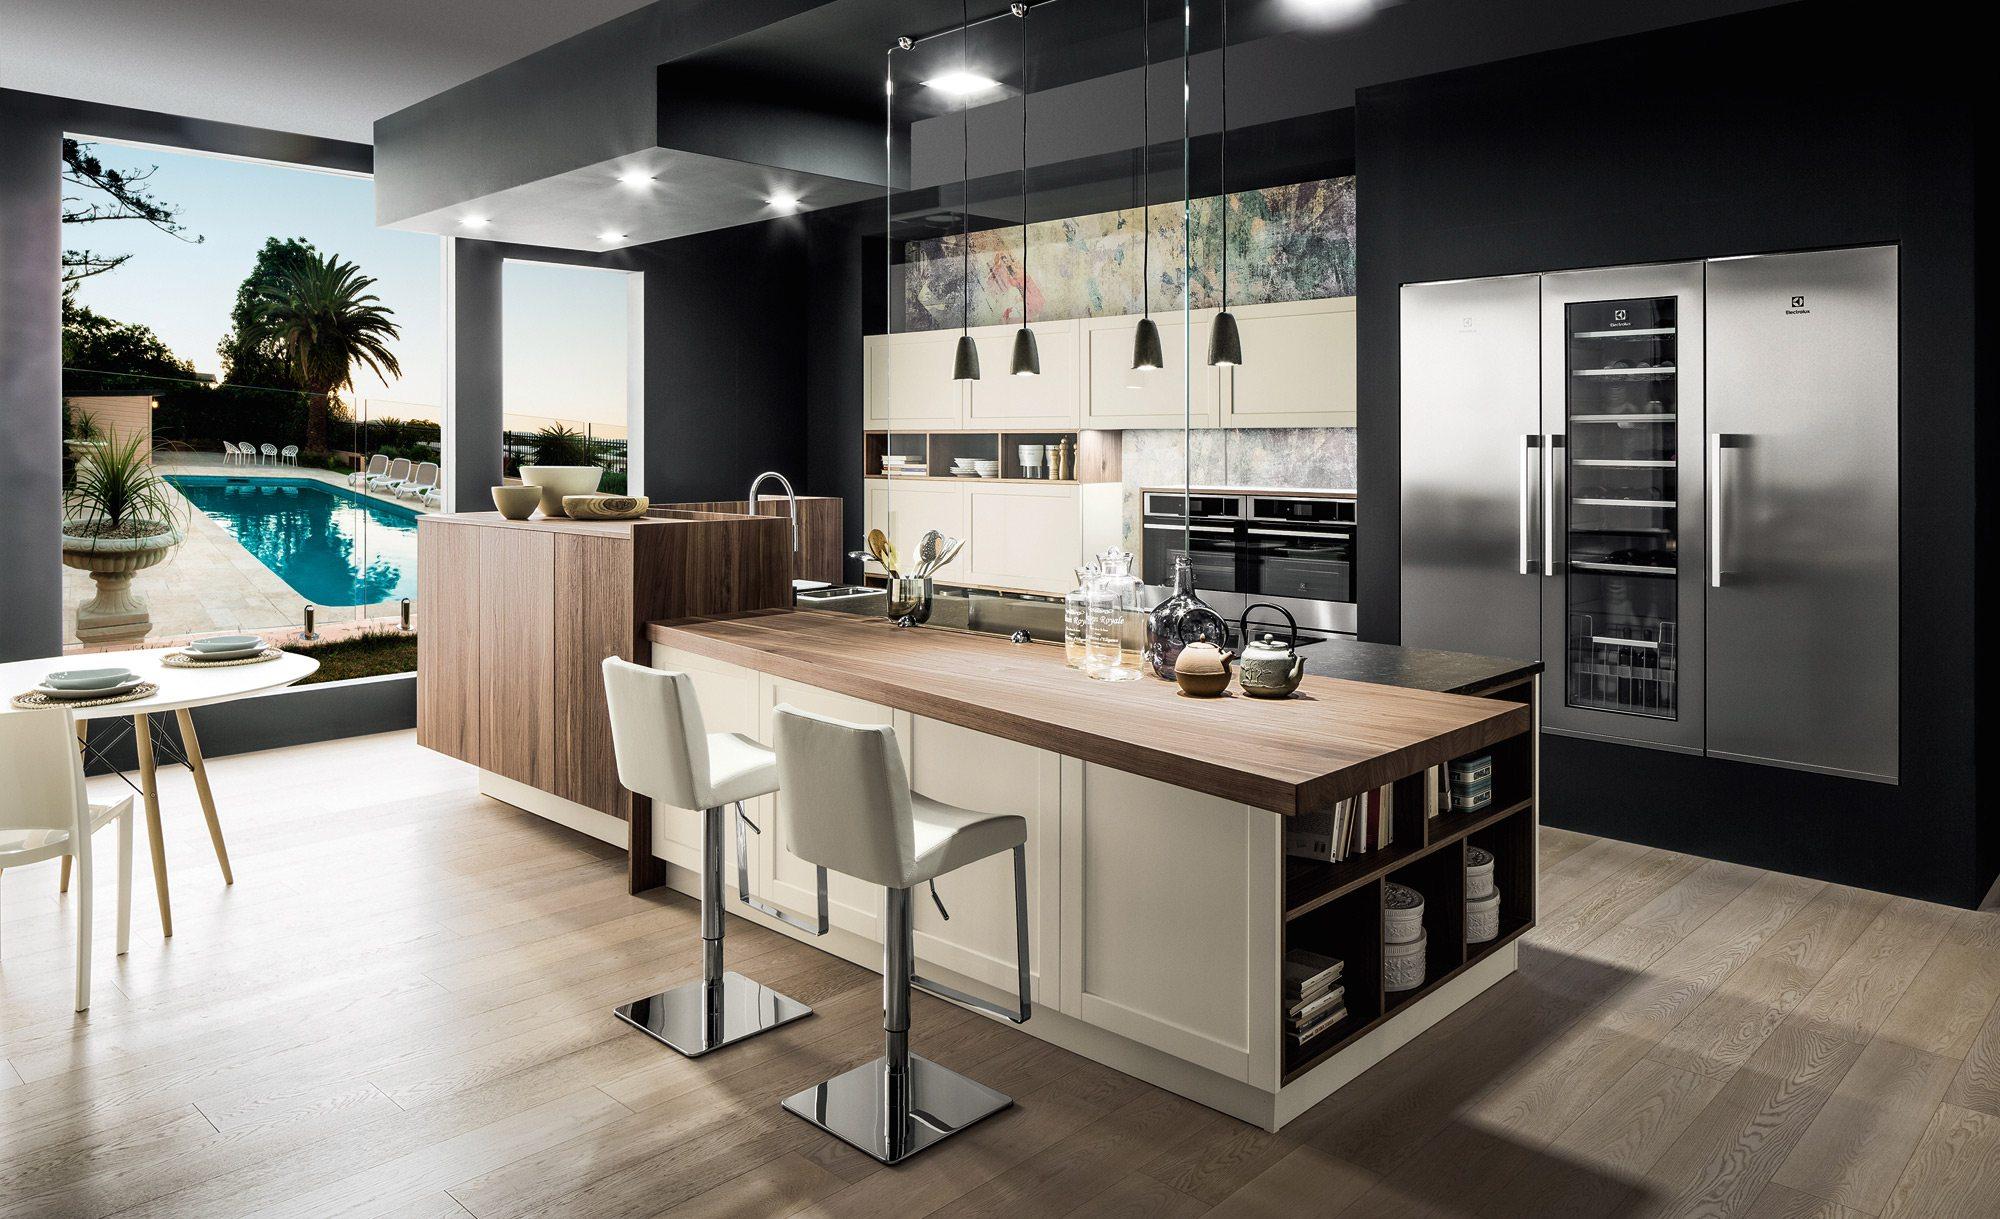 cuisines italiennes haut de gamme perfect cuisines italiennes haut de gamme avec rose couleur. Black Bedroom Furniture Sets. Home Design Ideas